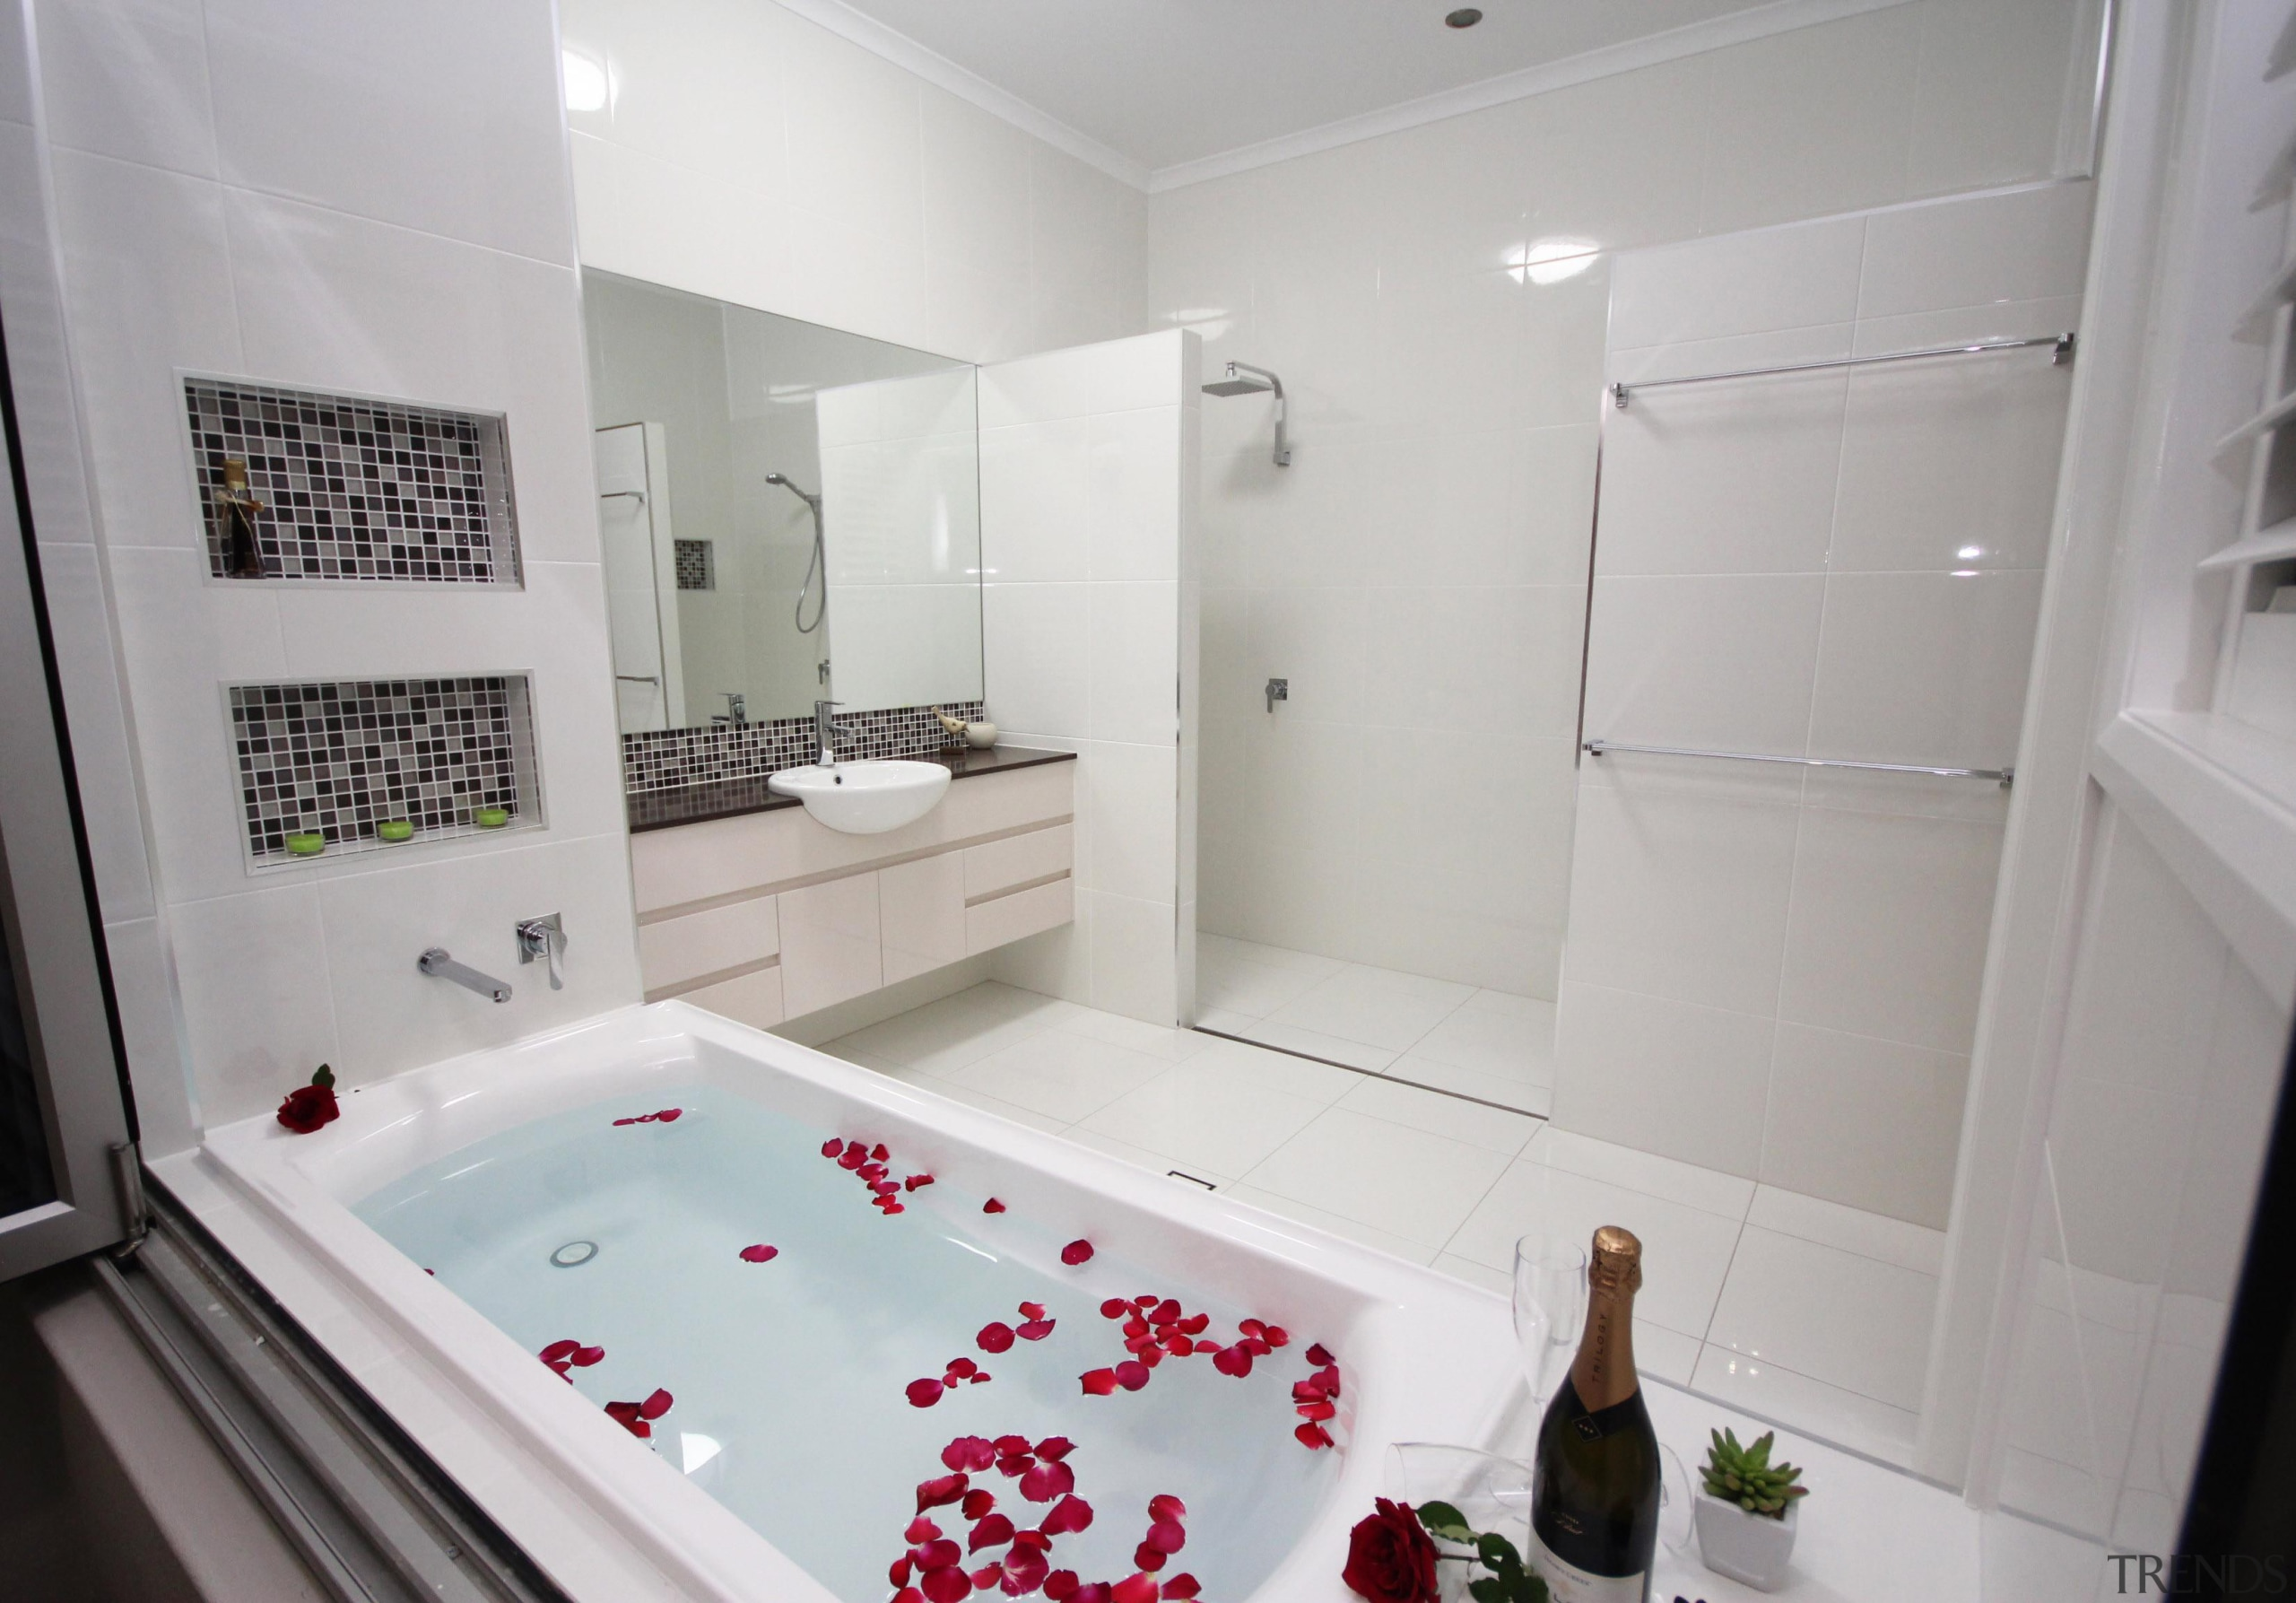 Winner Bathroom Design of the Year 2013 North bathroom, bathtub, floor, home, interior design, plumbing fixture, property, room, gray